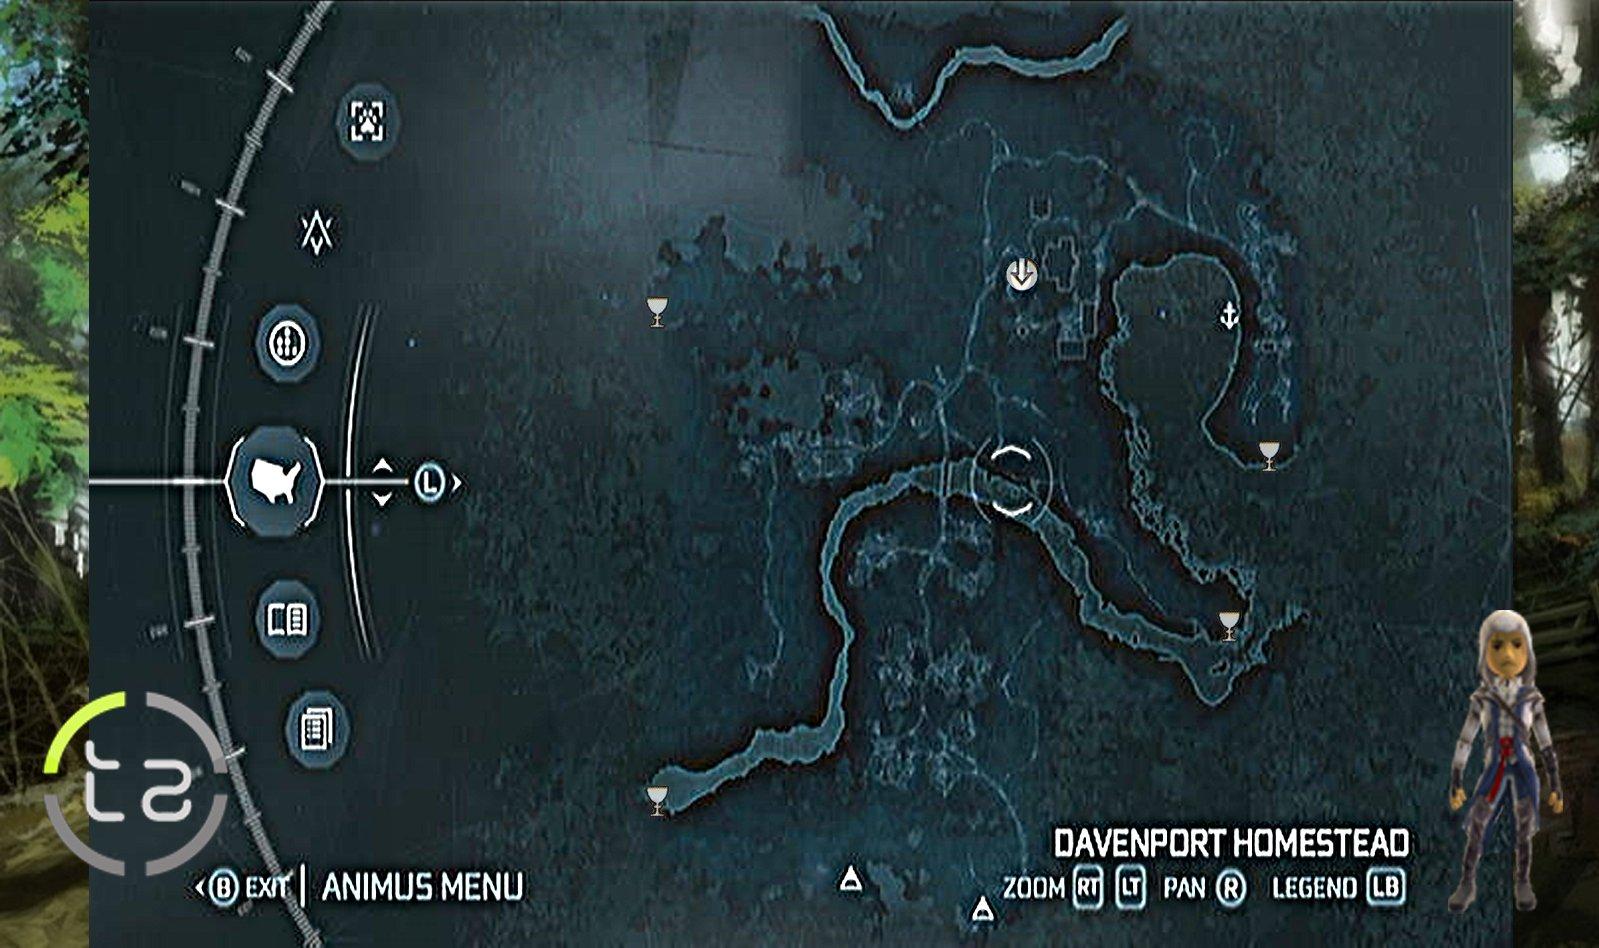 assassins creed 3 underground map new york